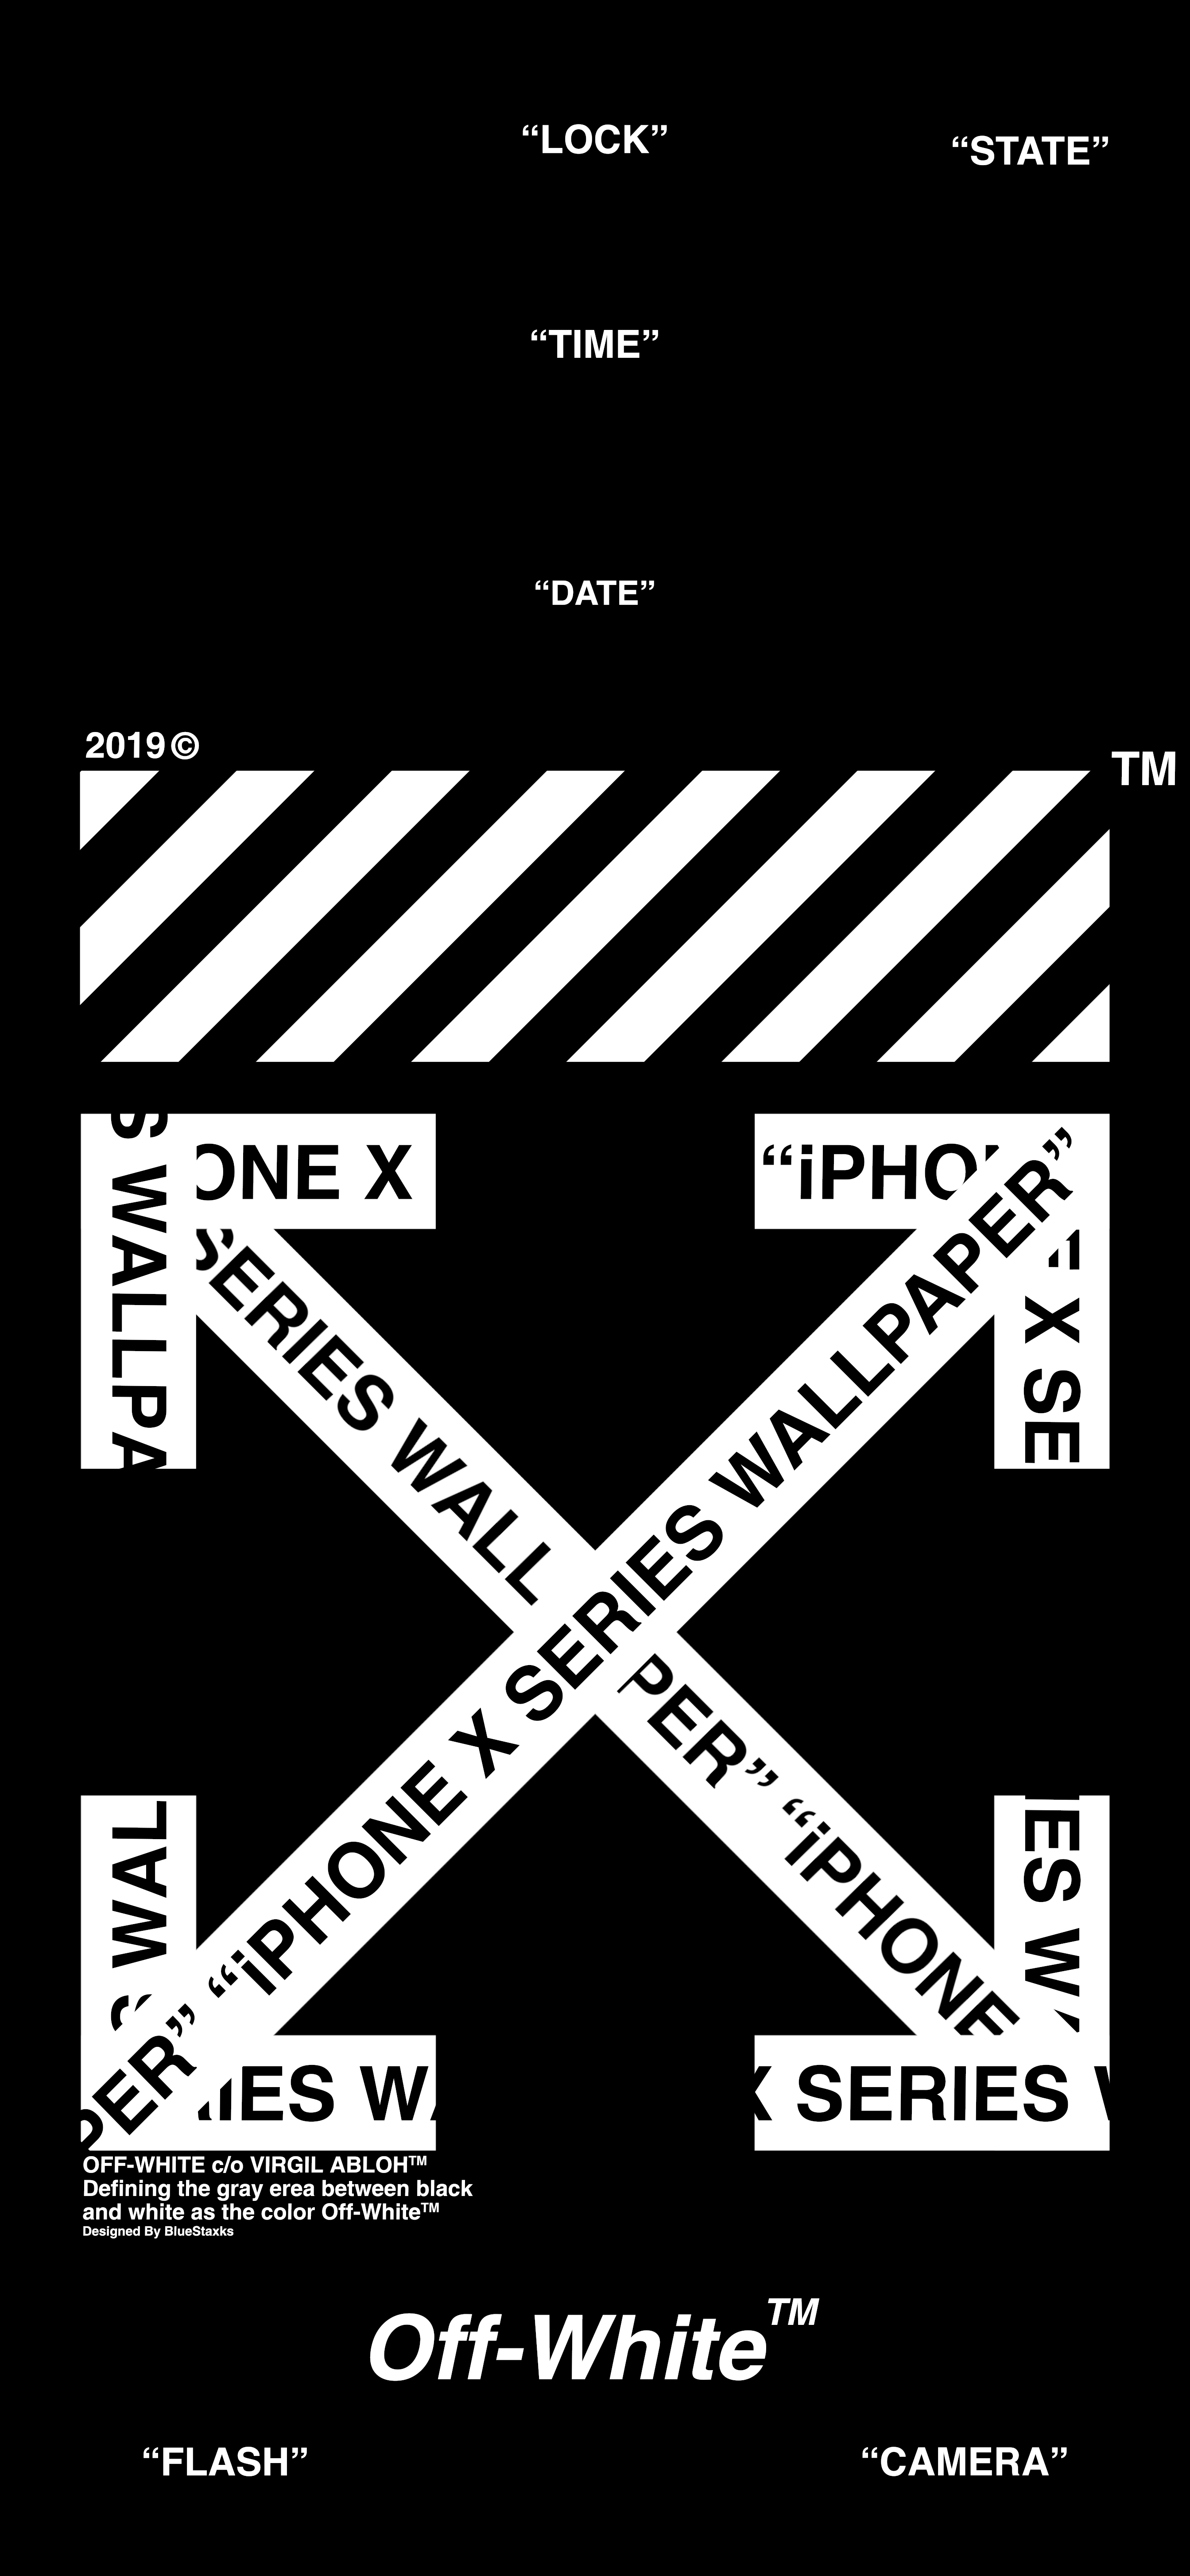 Off White Iphone X Series Wallpaper Ios 13 Wallpaper Dark Mode Tapety Tapeta Tla